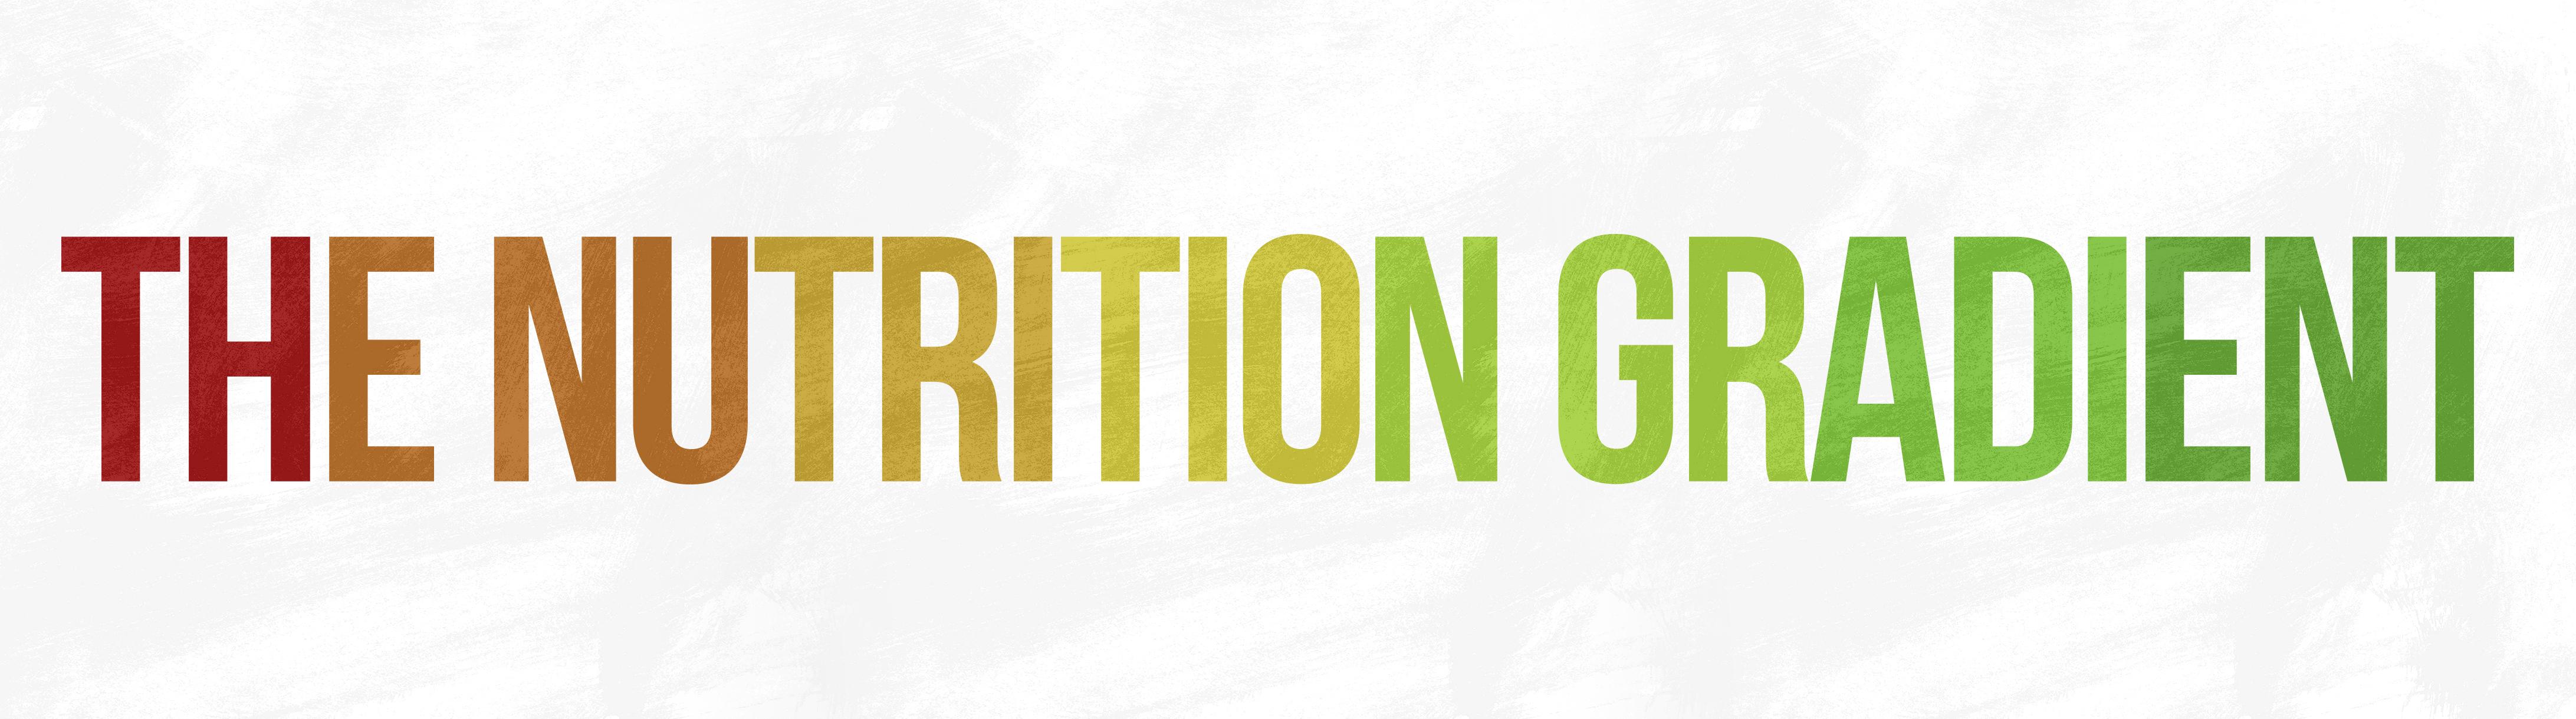 Nutrition Gradient